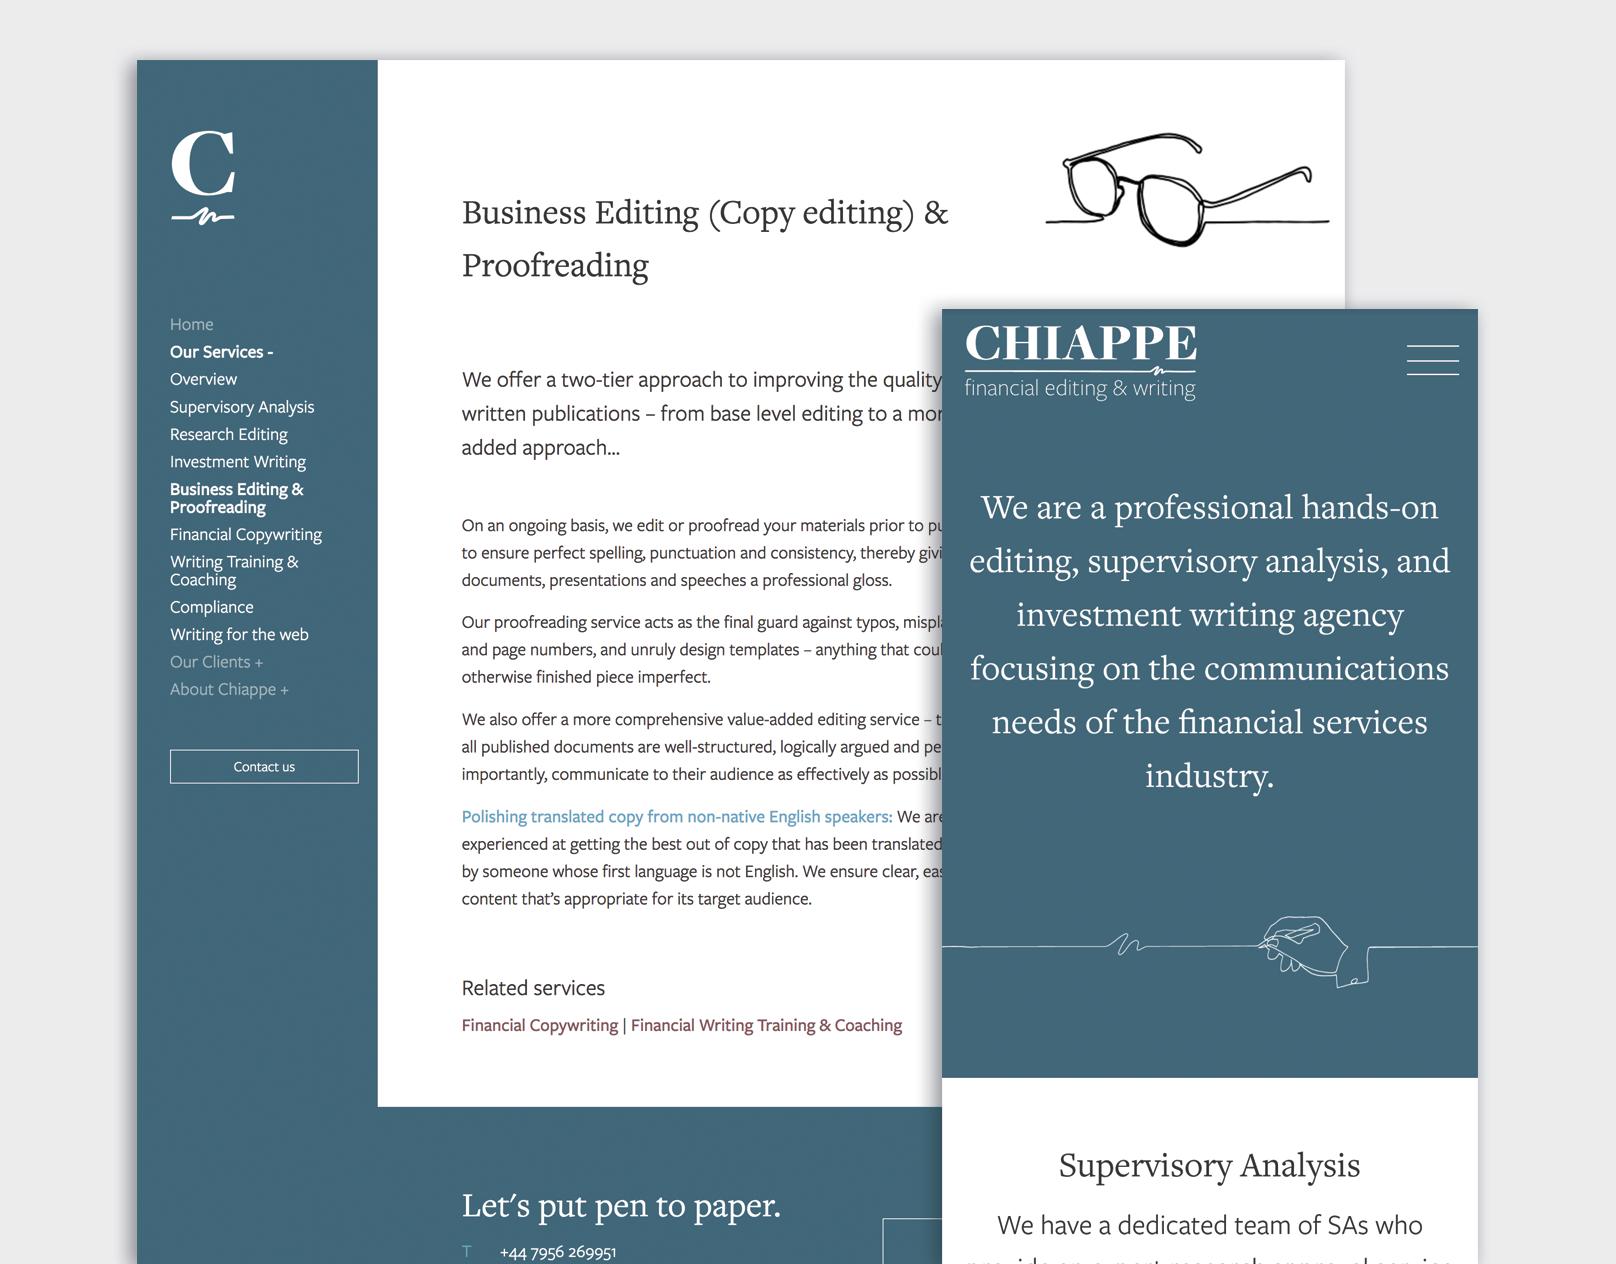 Chiappe Financial Editing & Writing